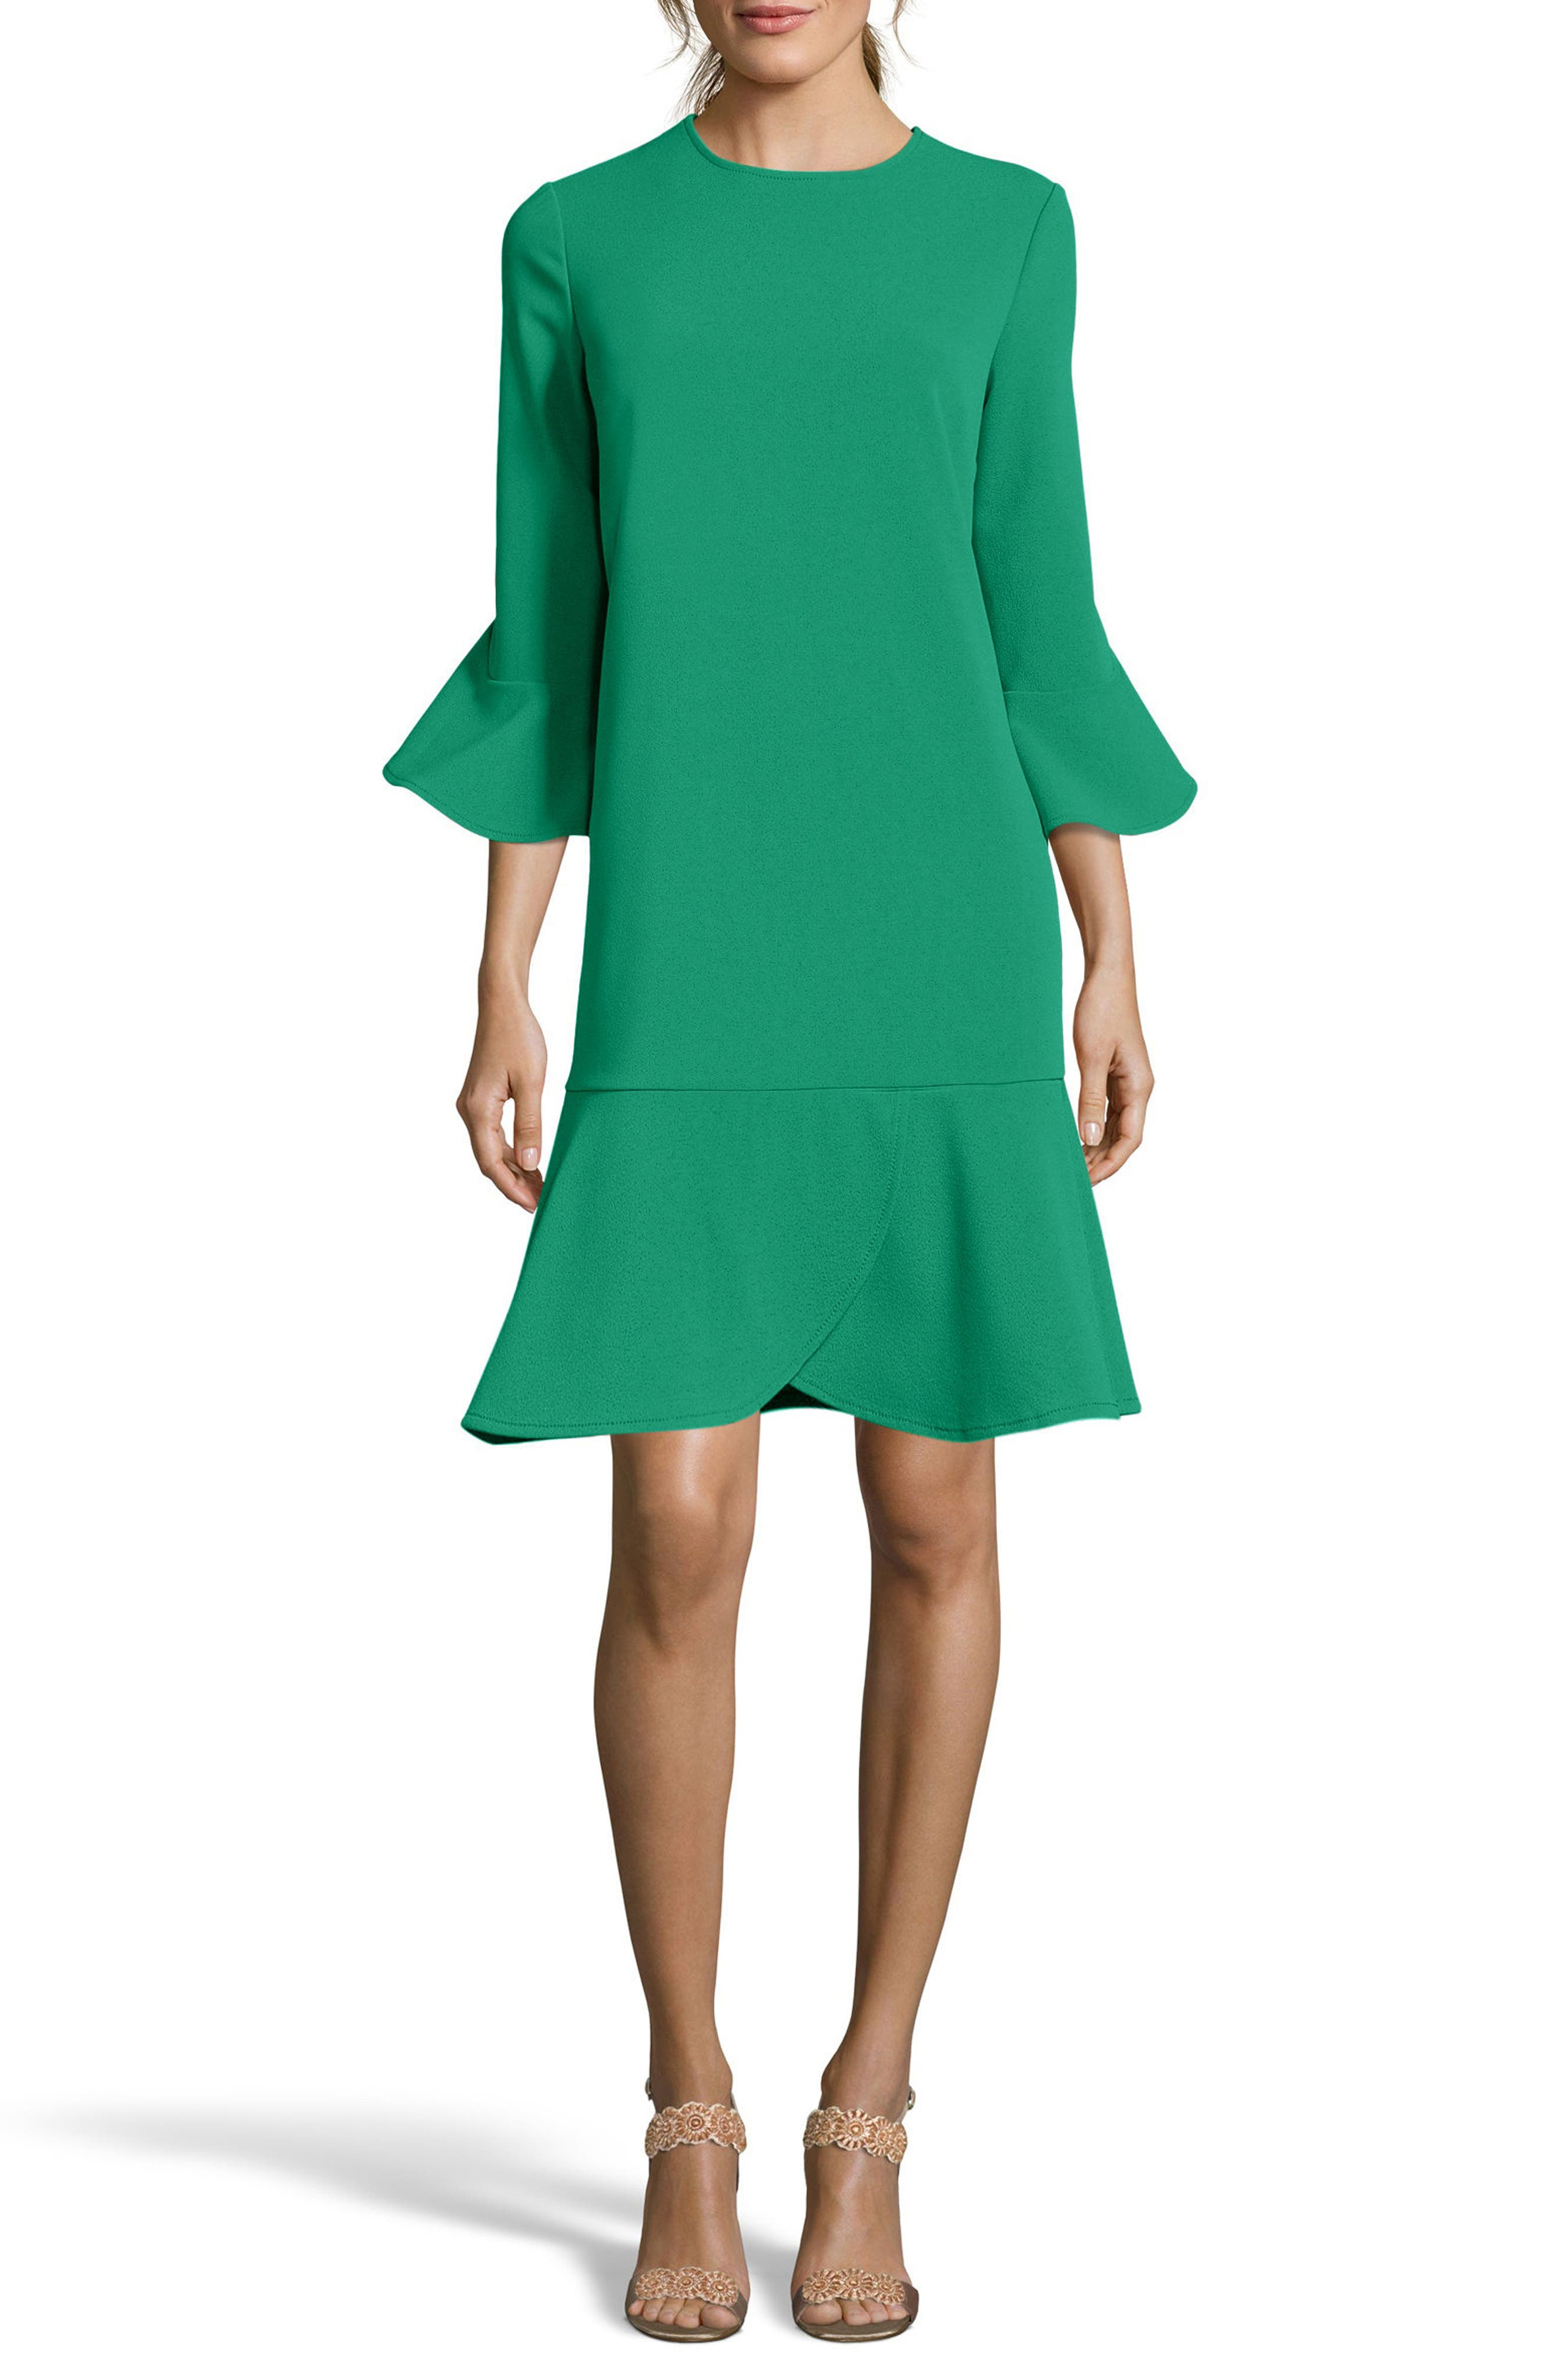 Alternate Image 1 Selected - ECI Ruffle Bell Sleeve Shift Dress